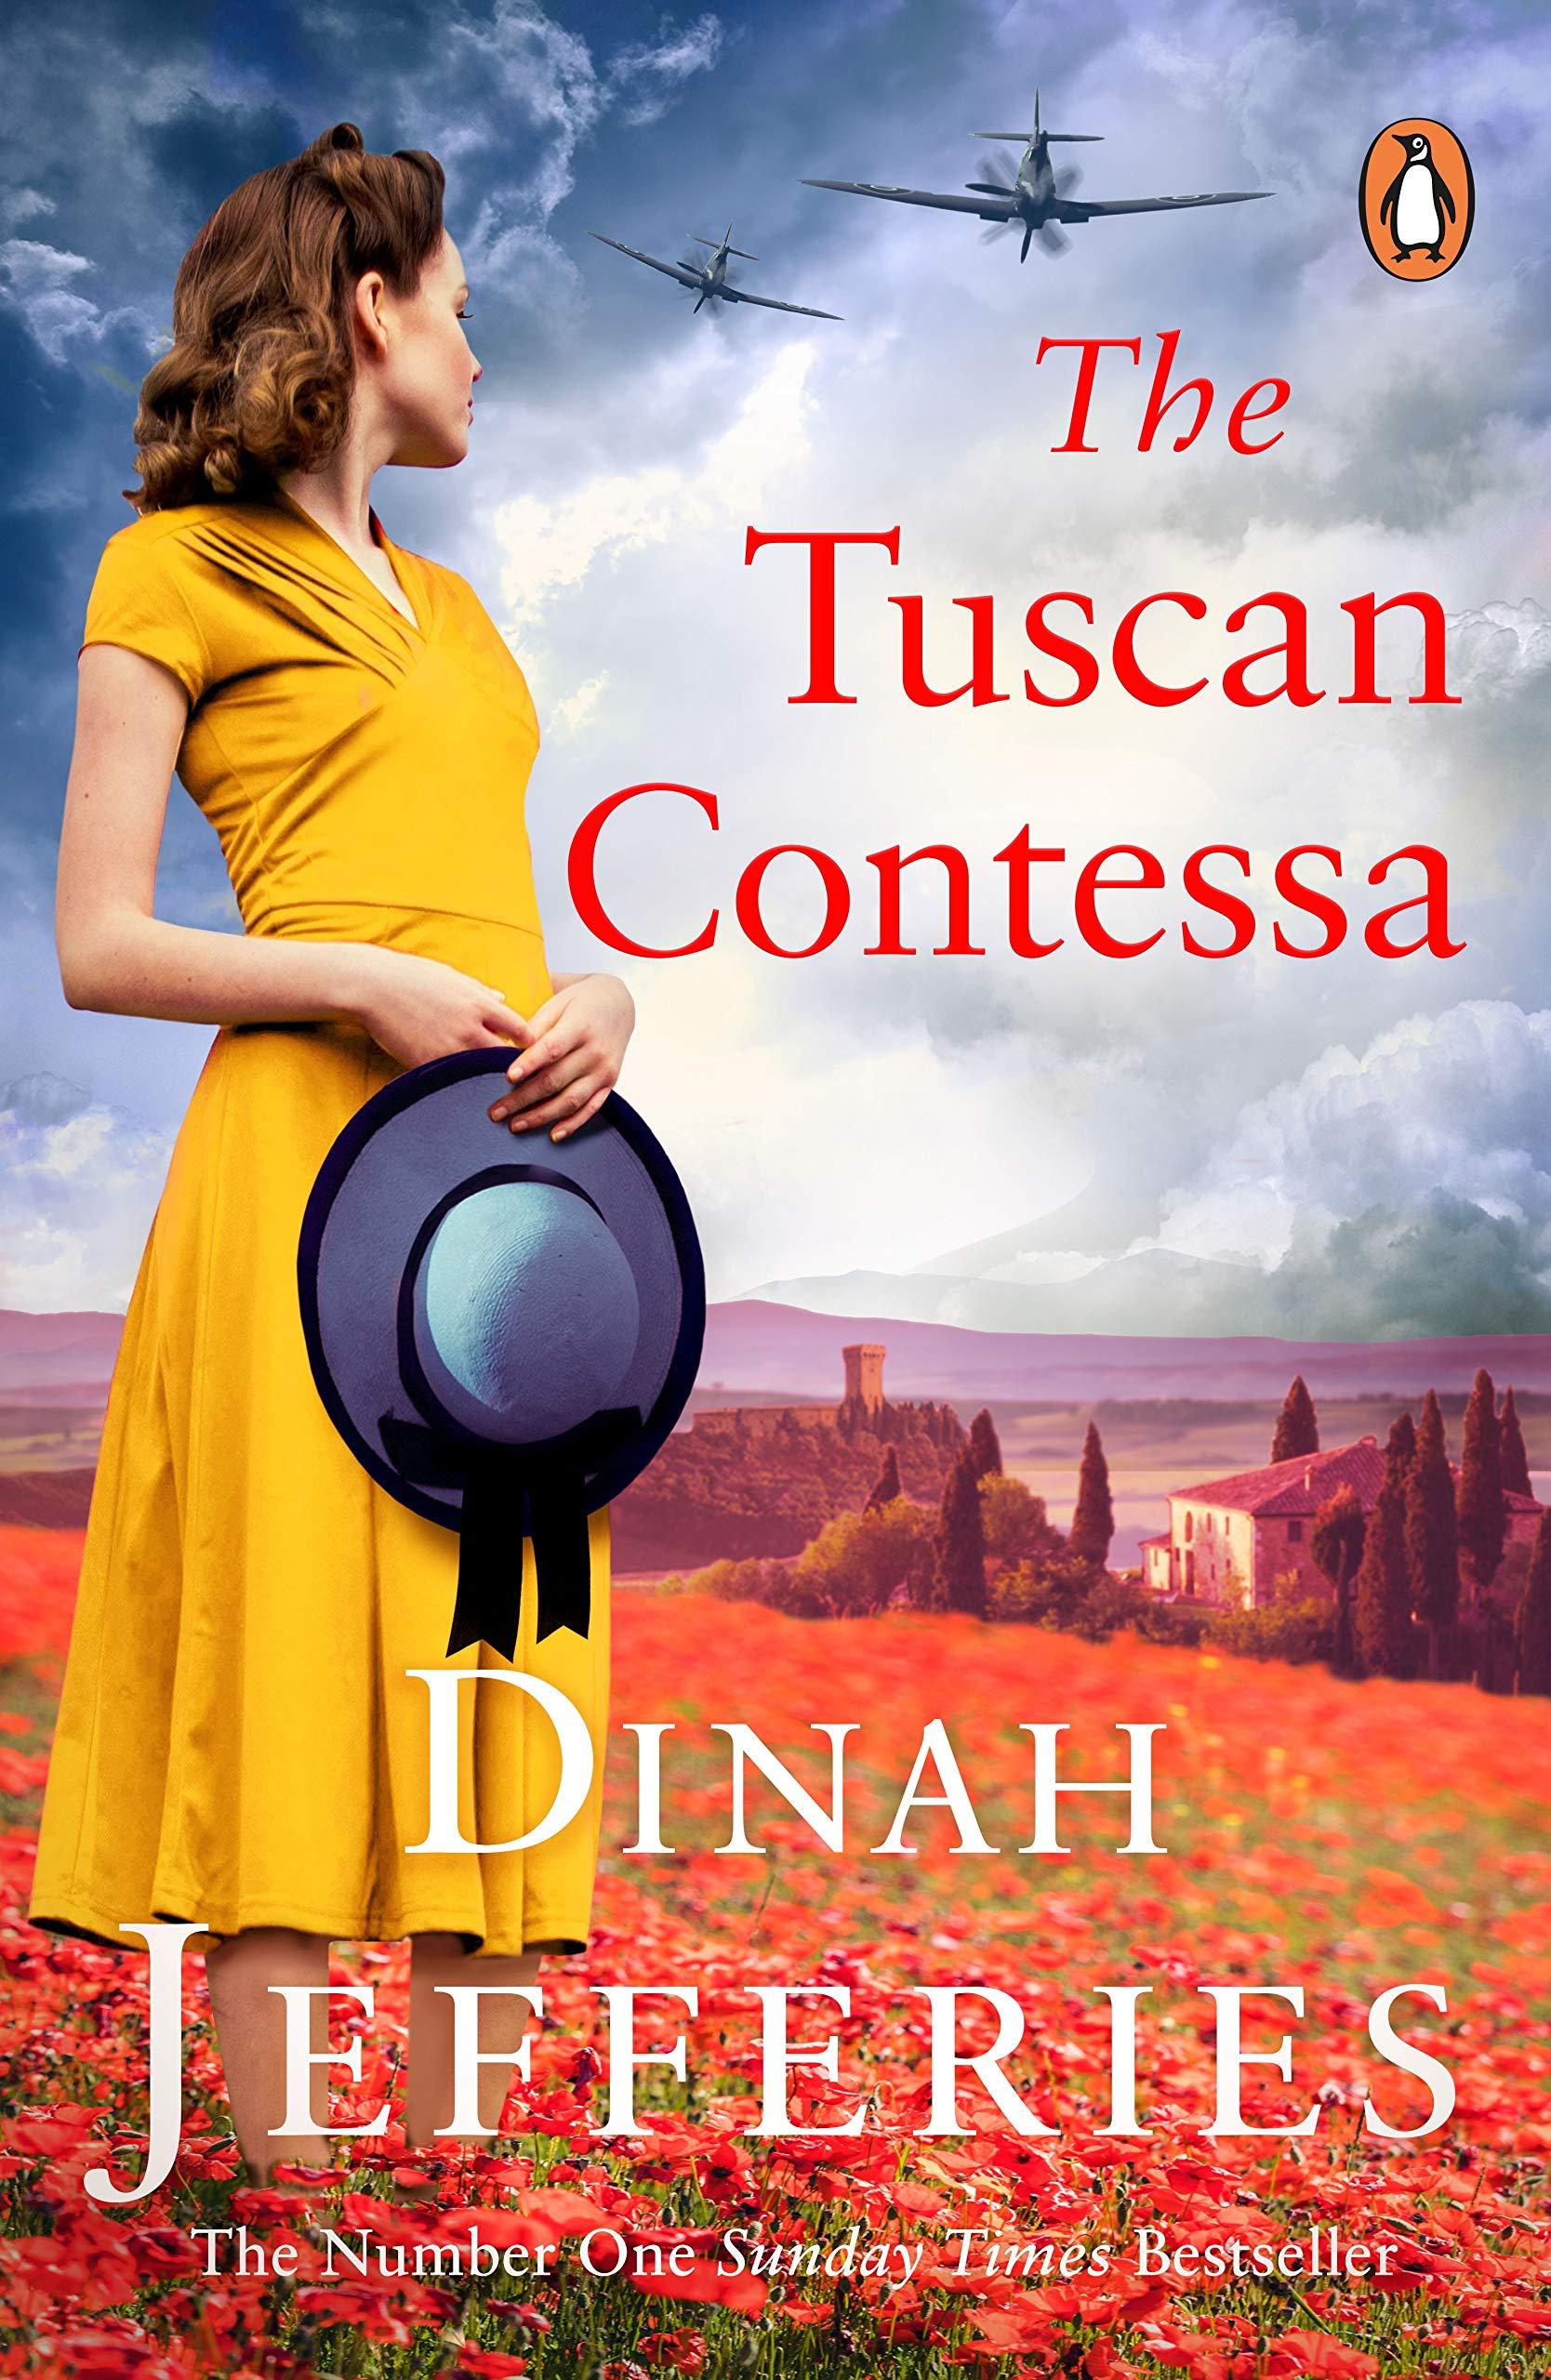 [PDF] [EPUB] The Tuscan Contessa Download by Dinah Jefferies